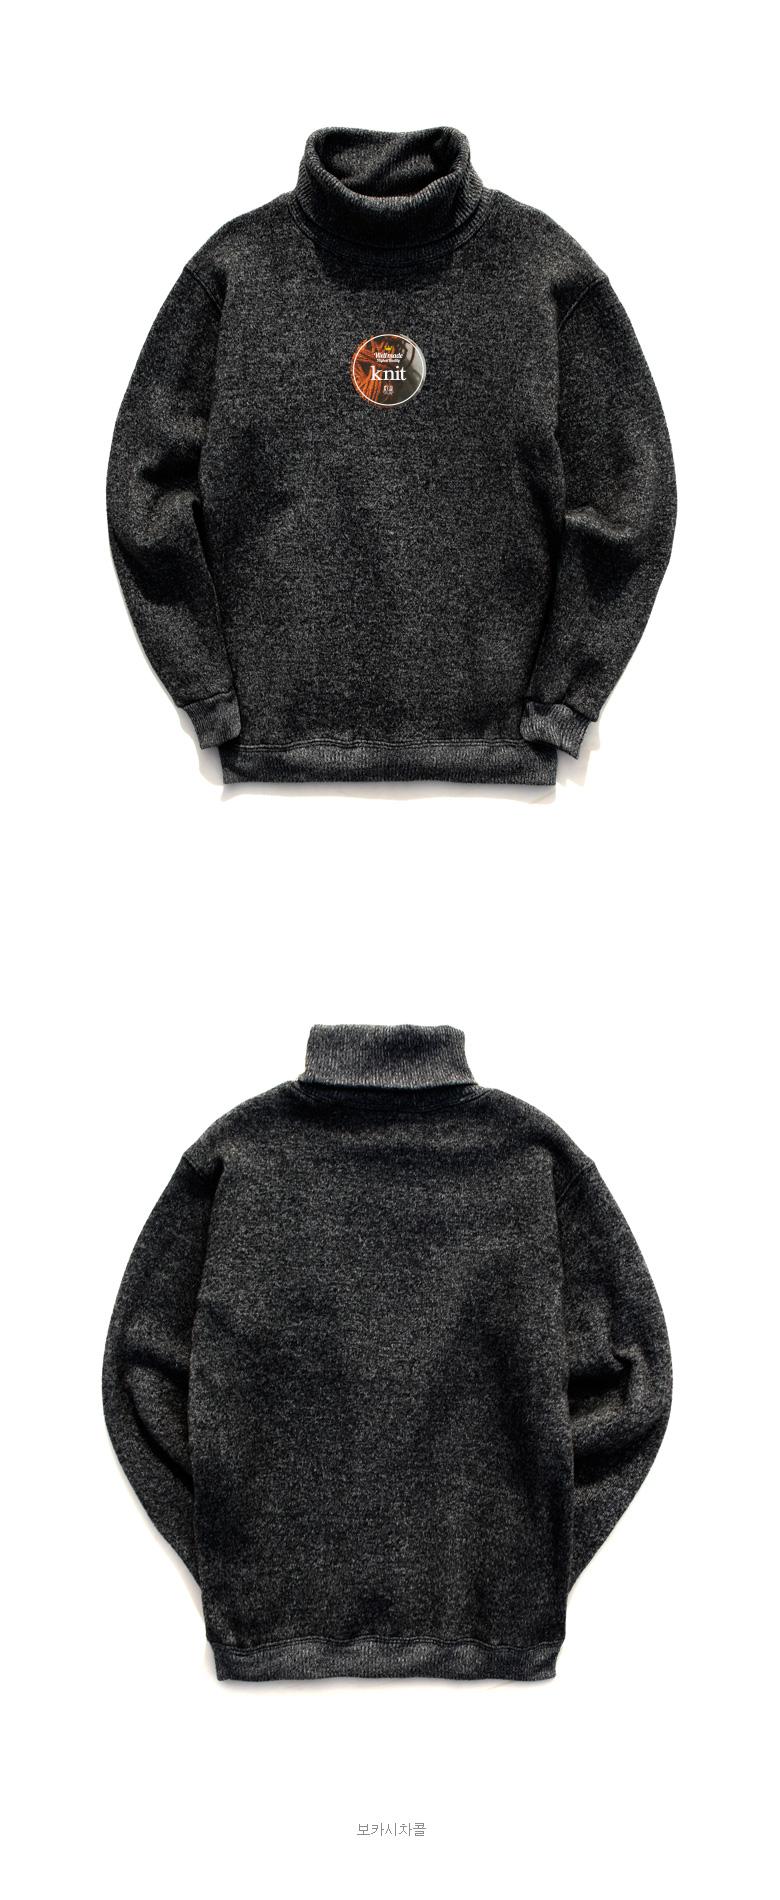 20161129_fp_mild_knit_khaki_sm.jpg